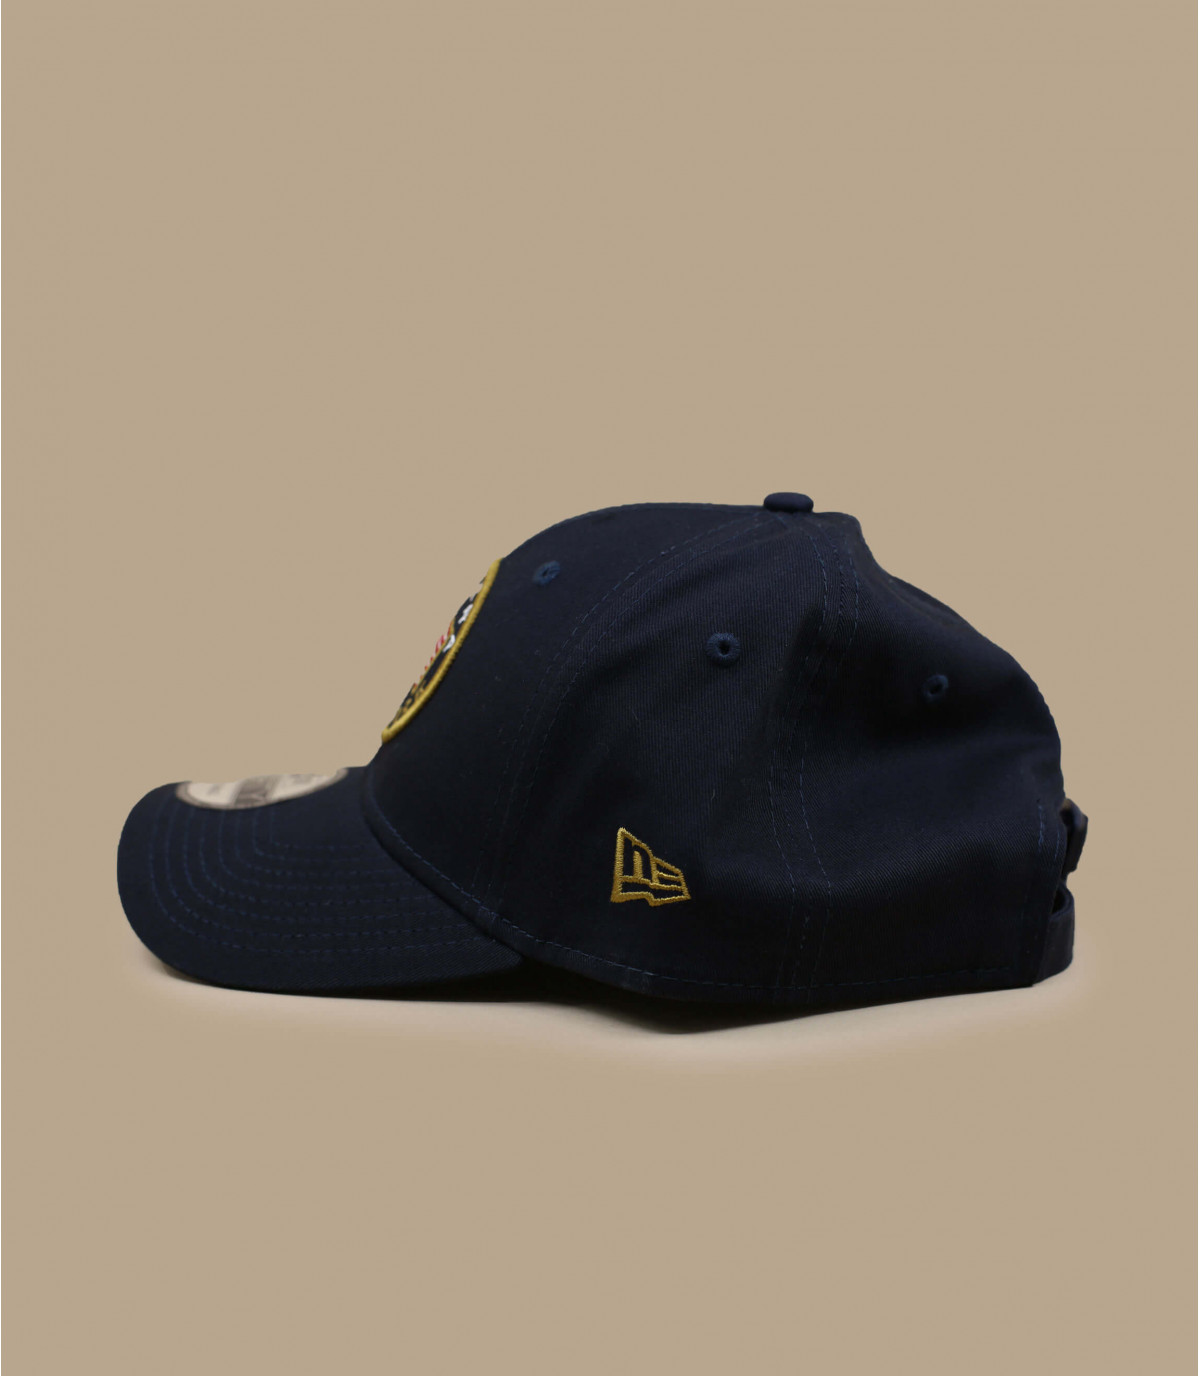 blauwe Amerikaanse vlag cap